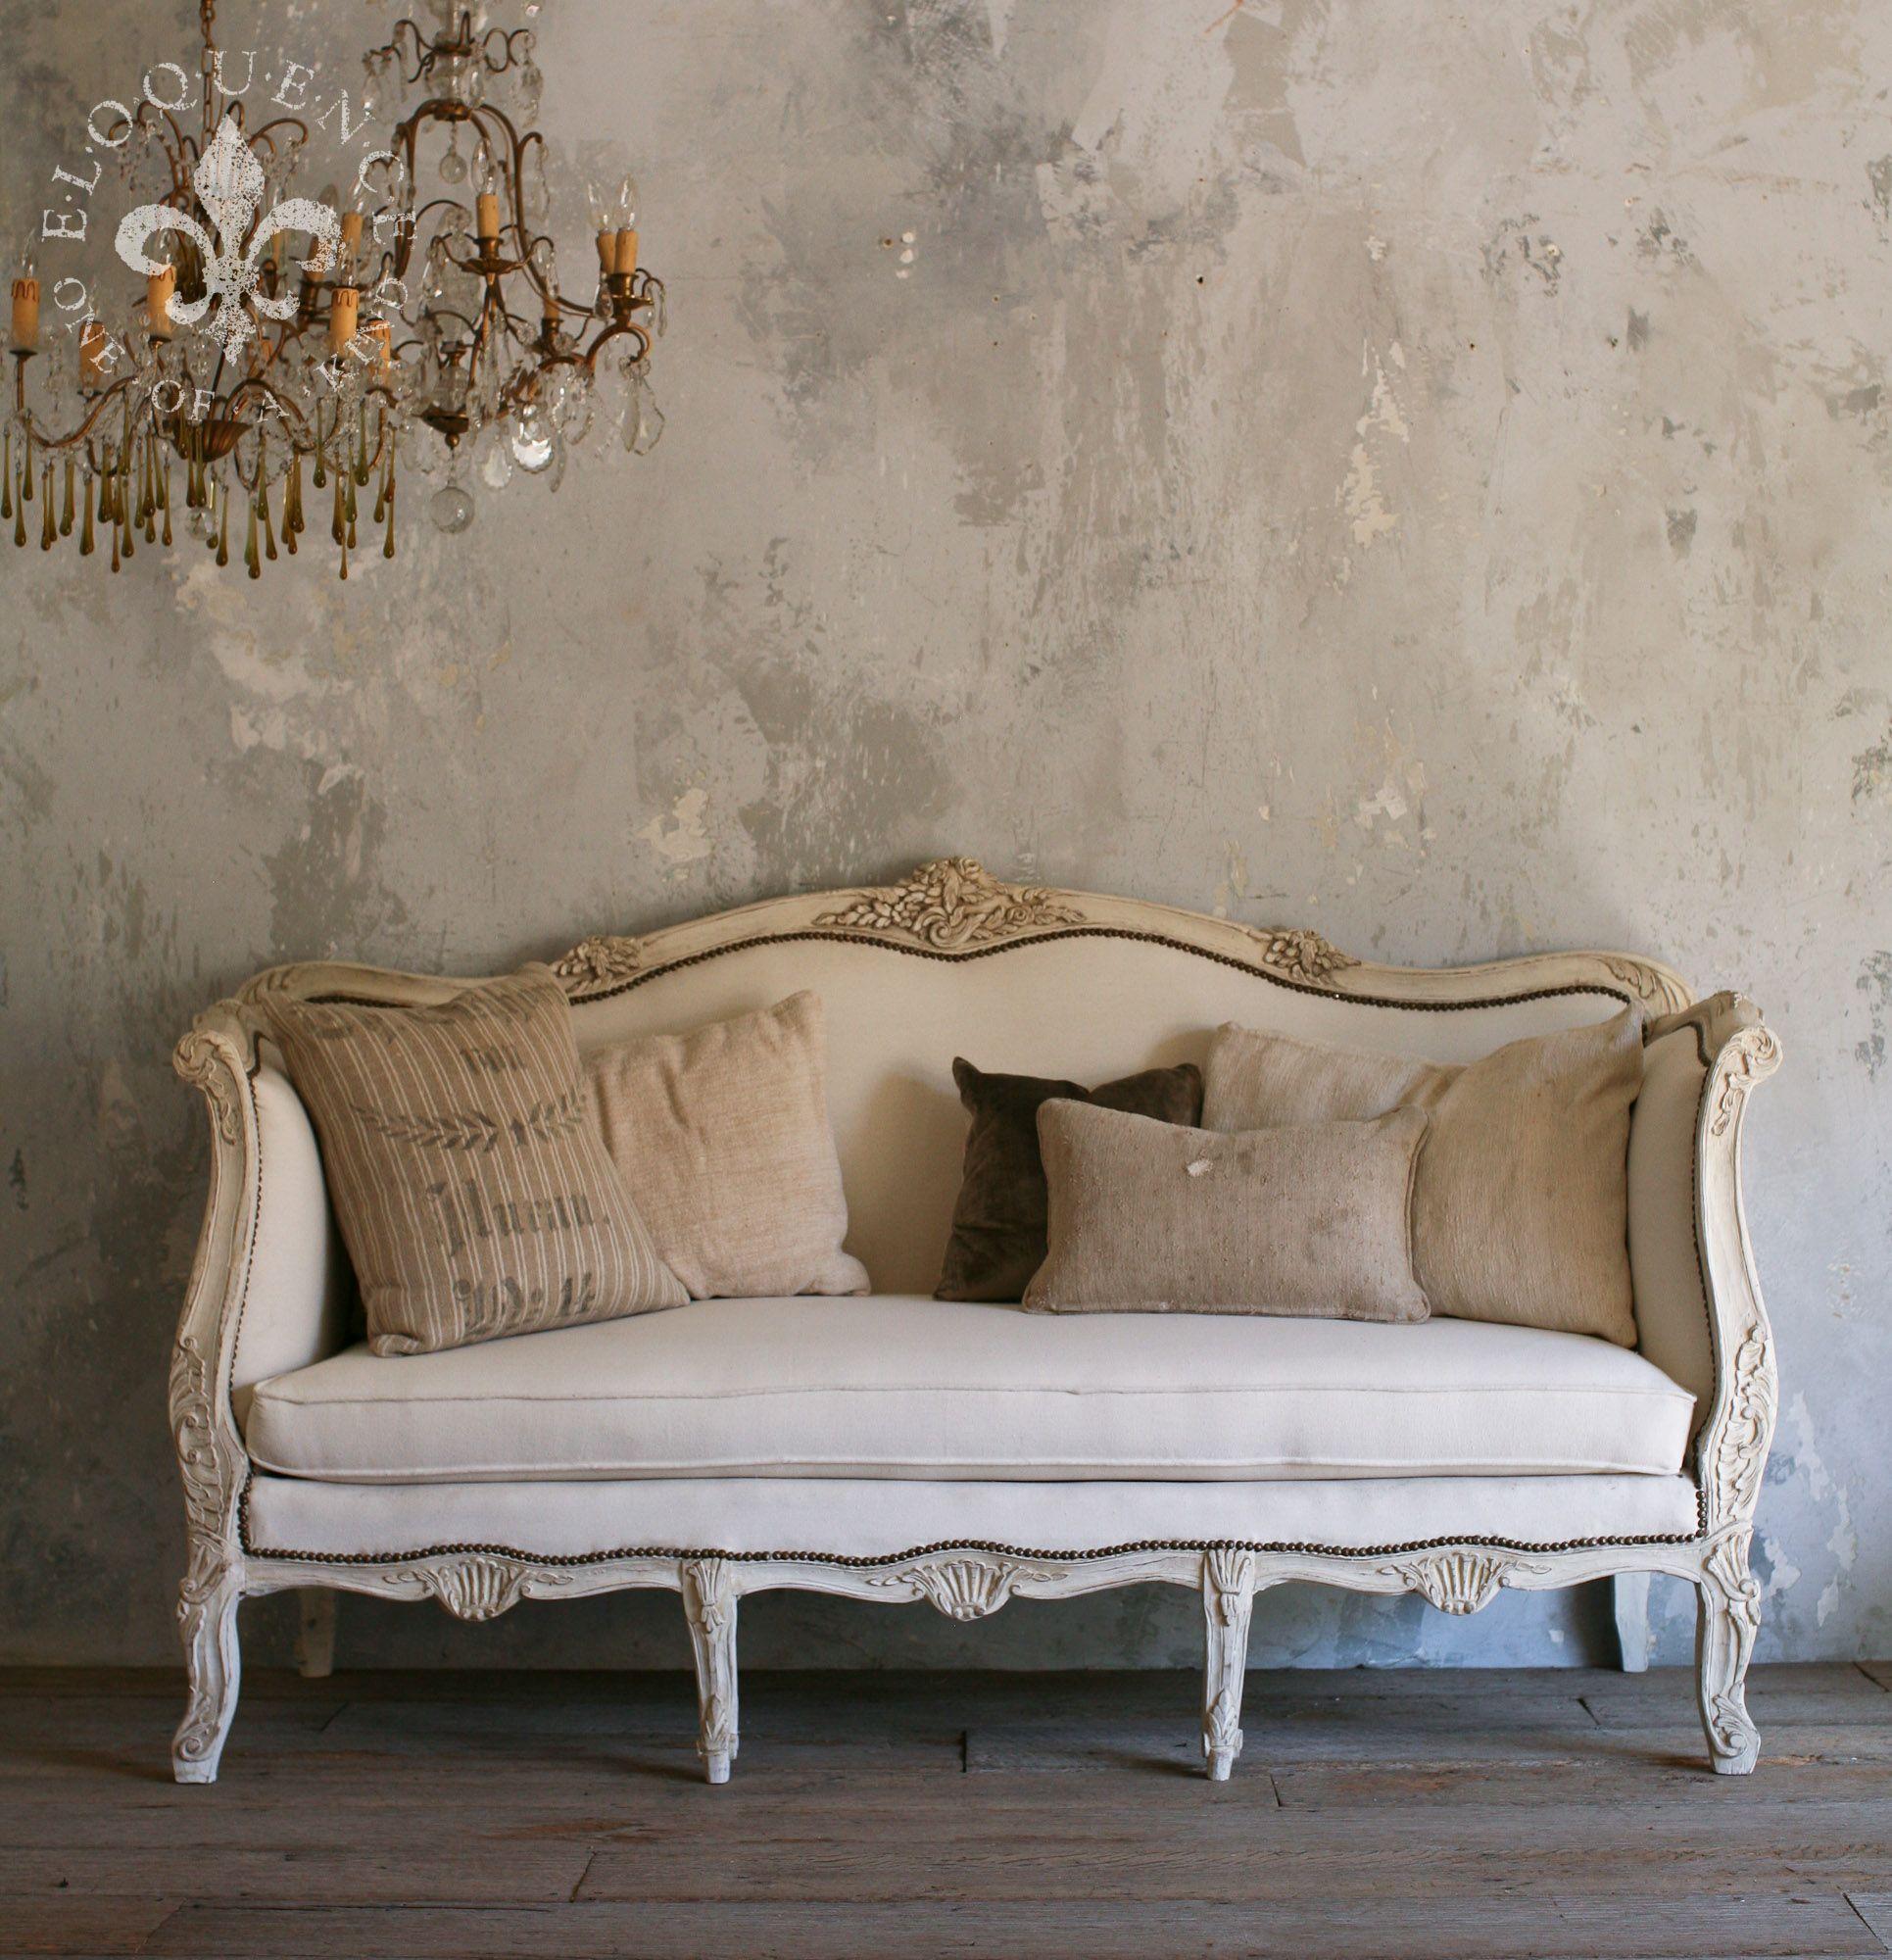 White Washed Vintage Daybed Vintage Couch Vintage Sofa Furniture